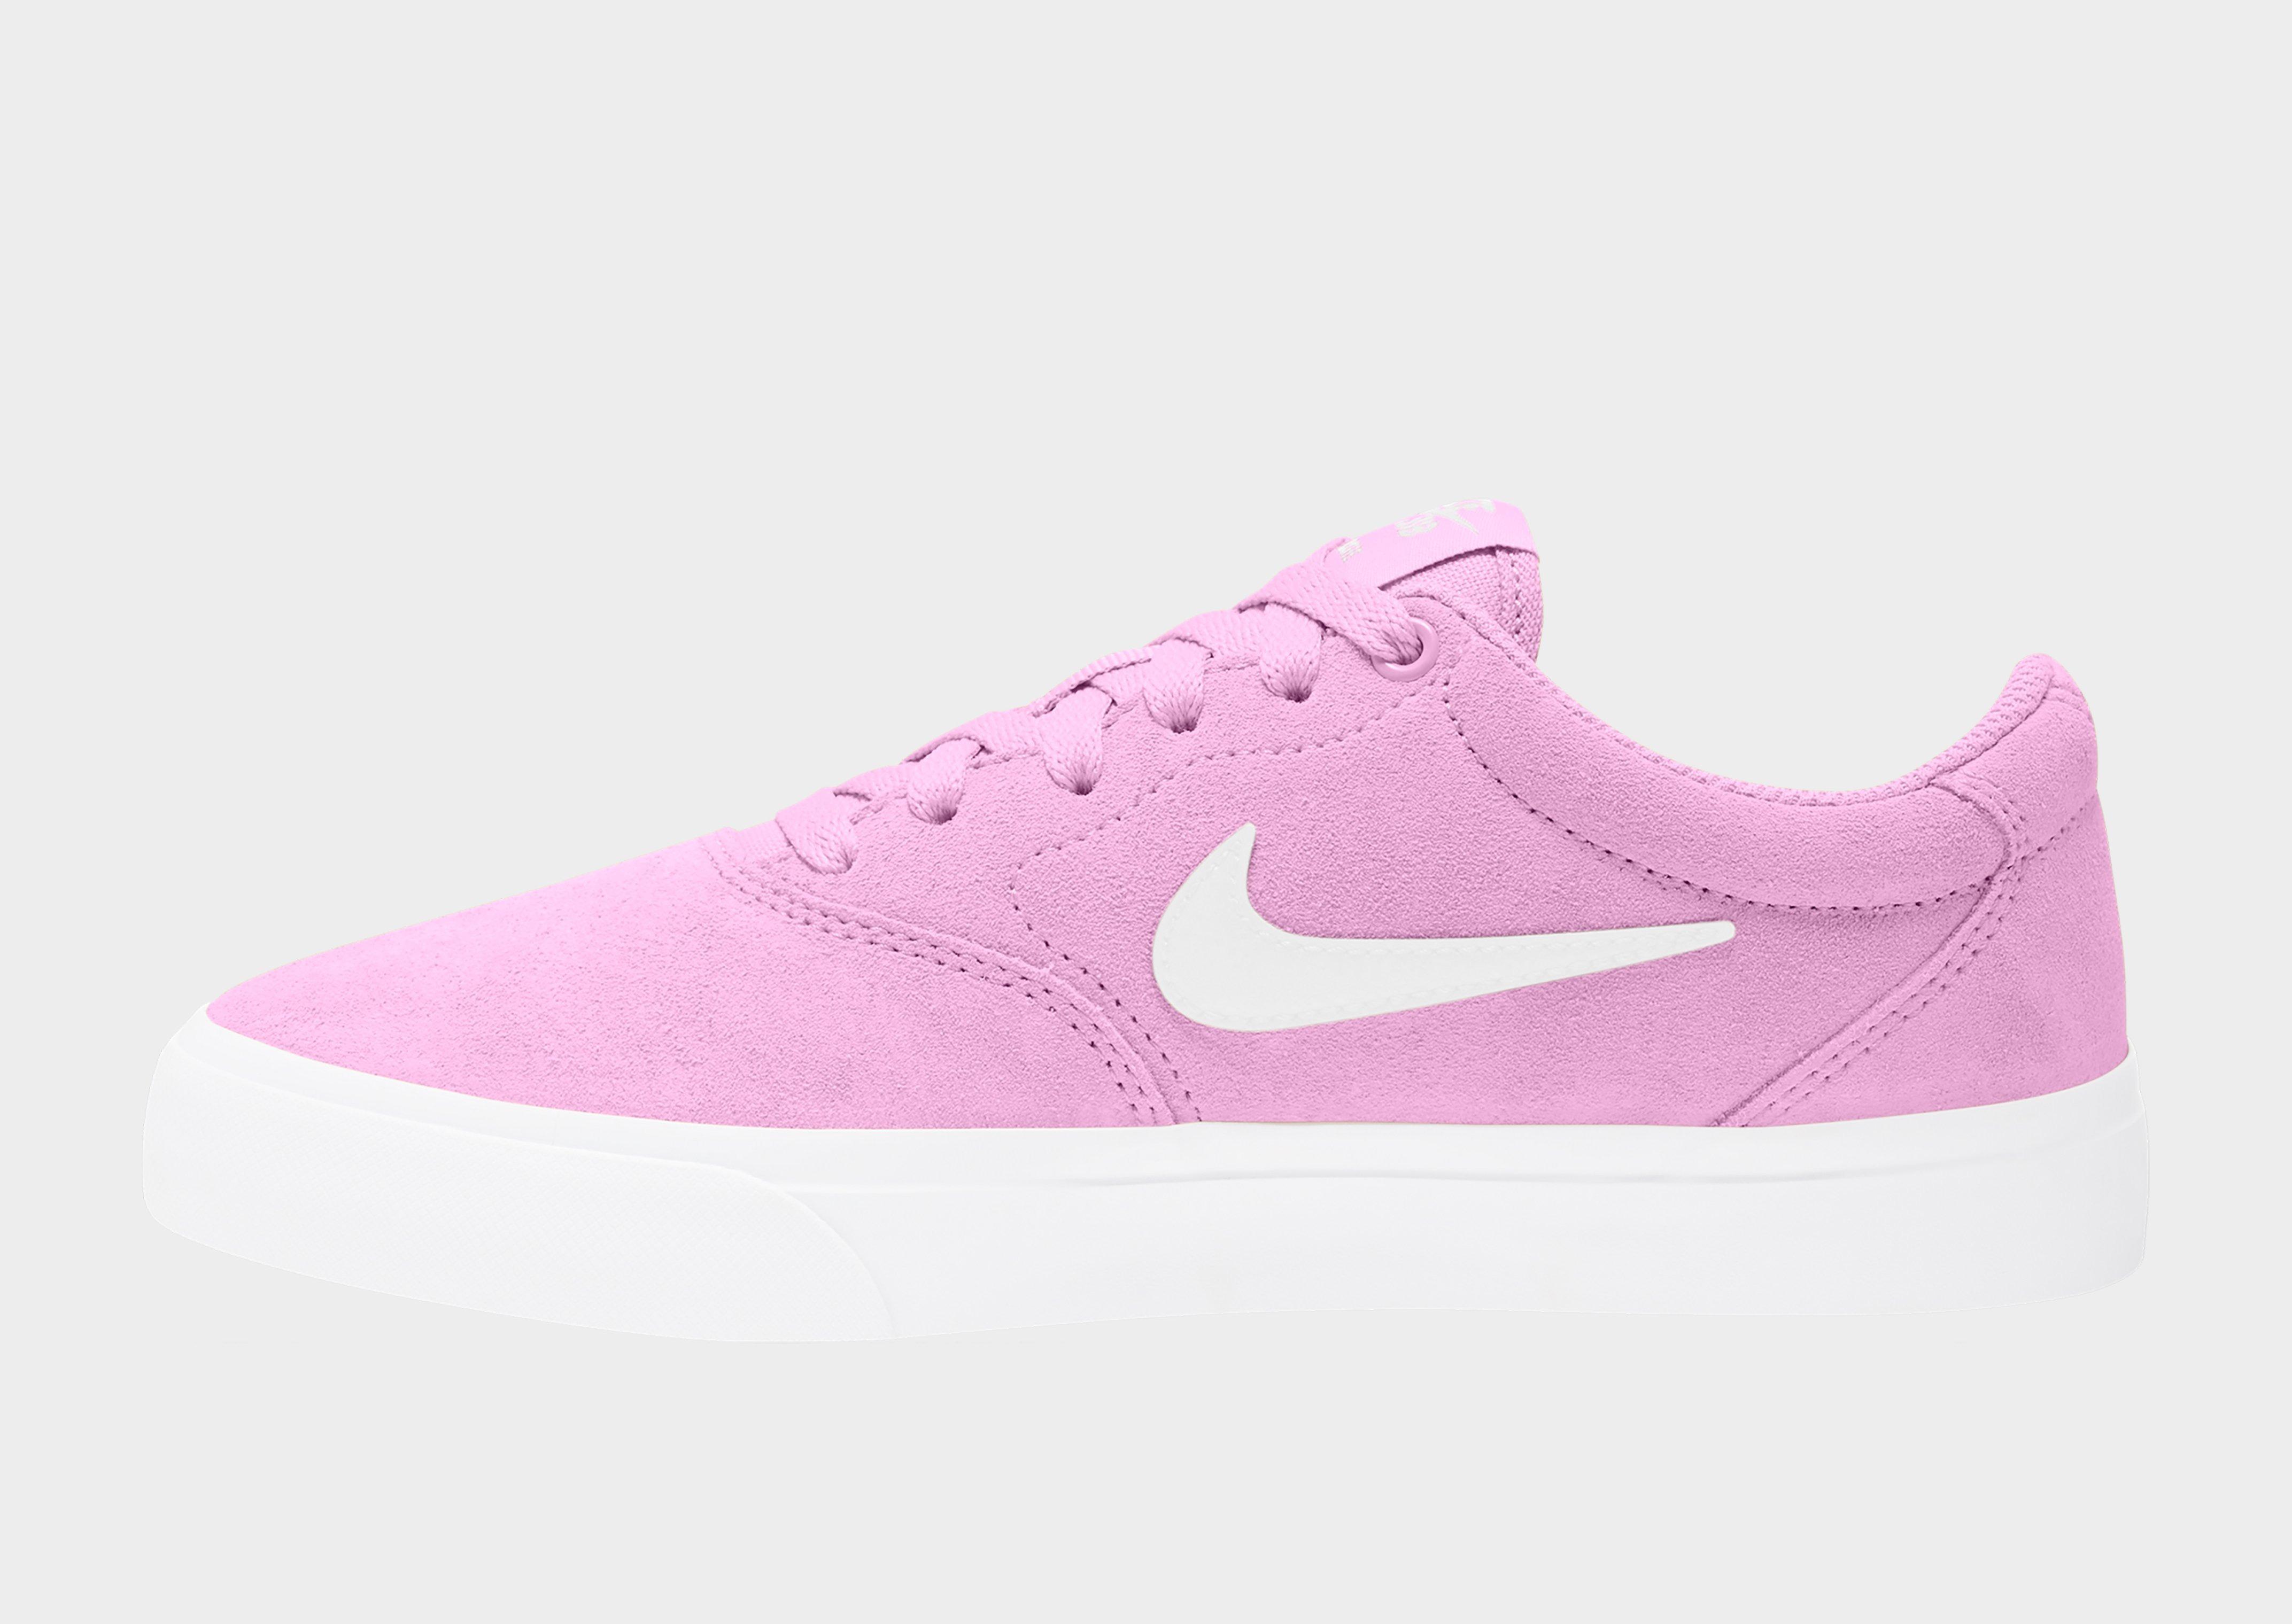 Nike SB Chaussure de skateboard Nike SB Charge Suede pour Femme | JD Sports